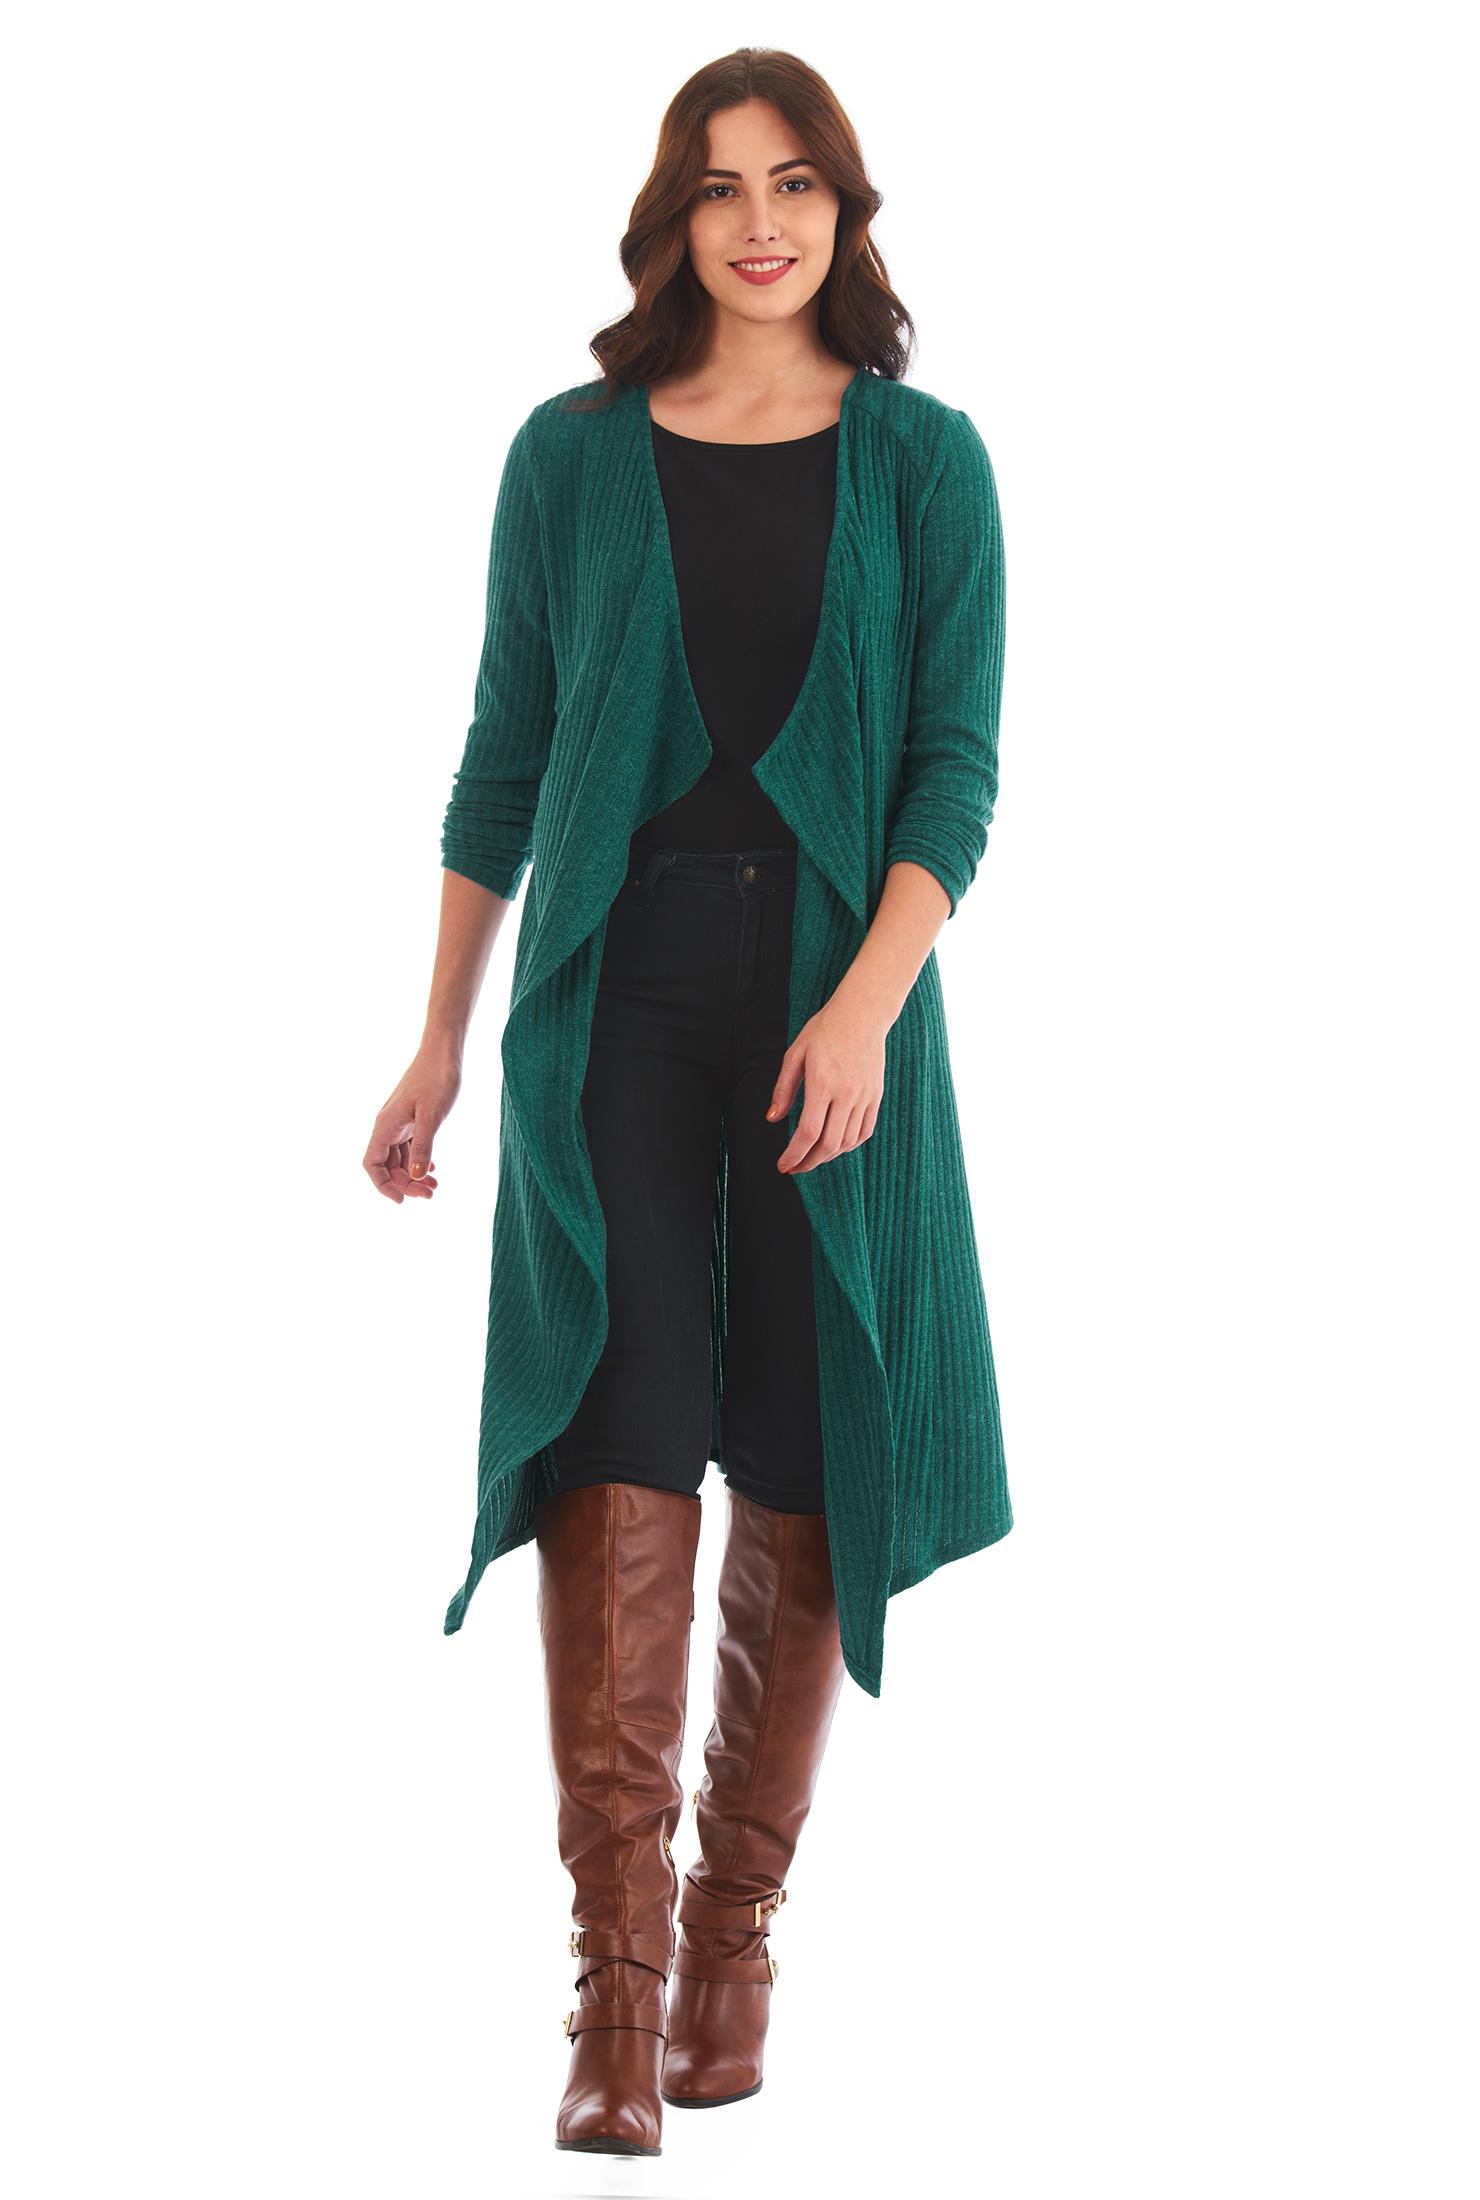 eShakti Women's Sweater rib knit open front long cardigan CL0052066